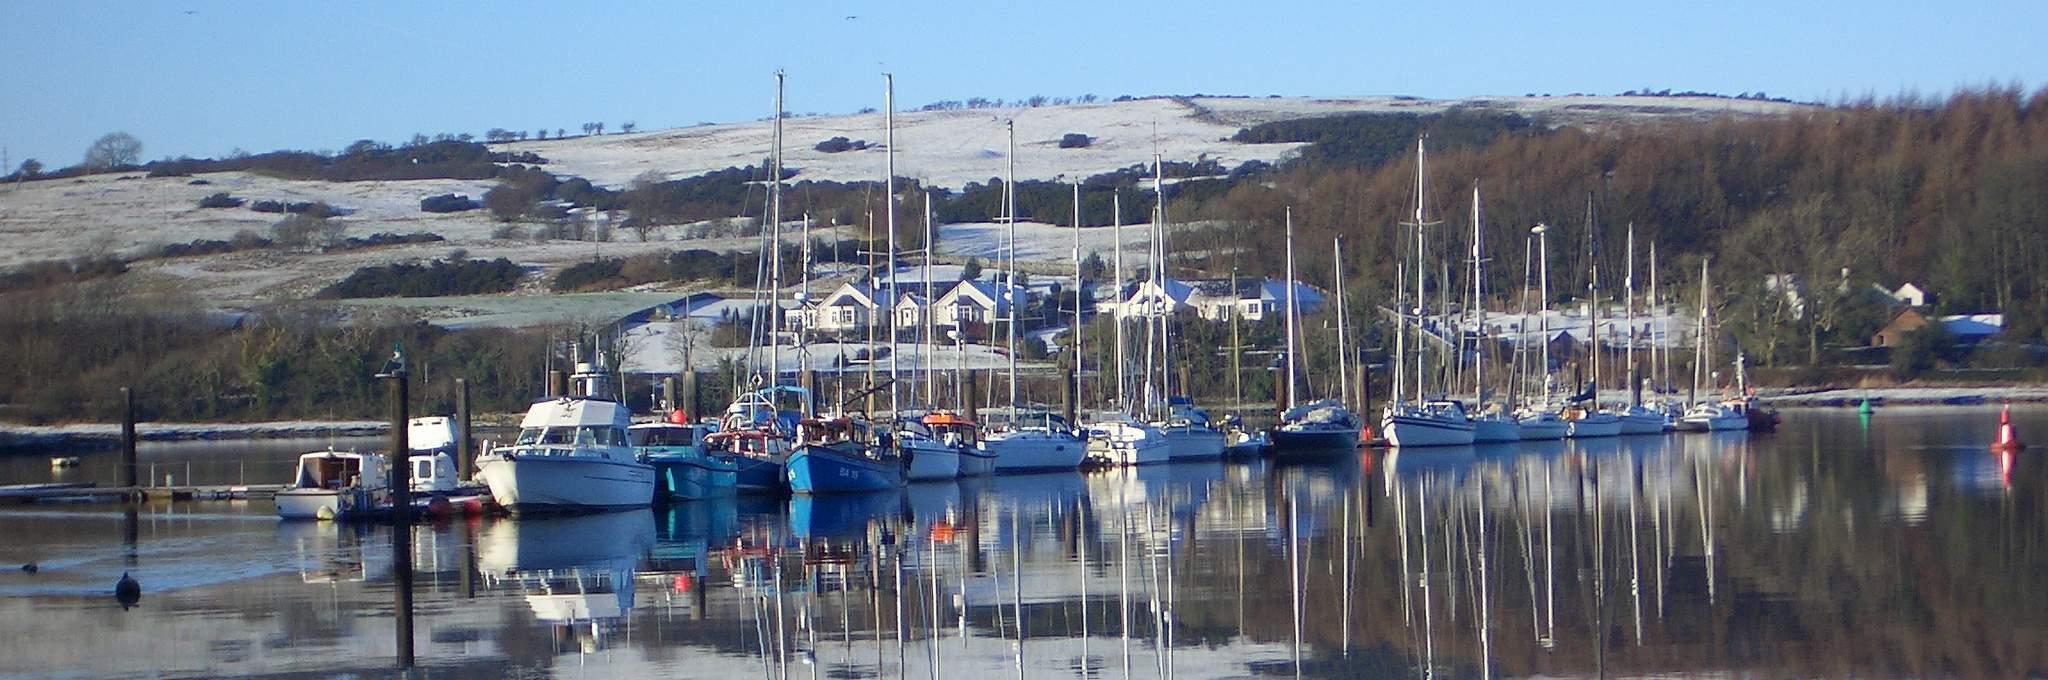 Kirkcudbright Marina